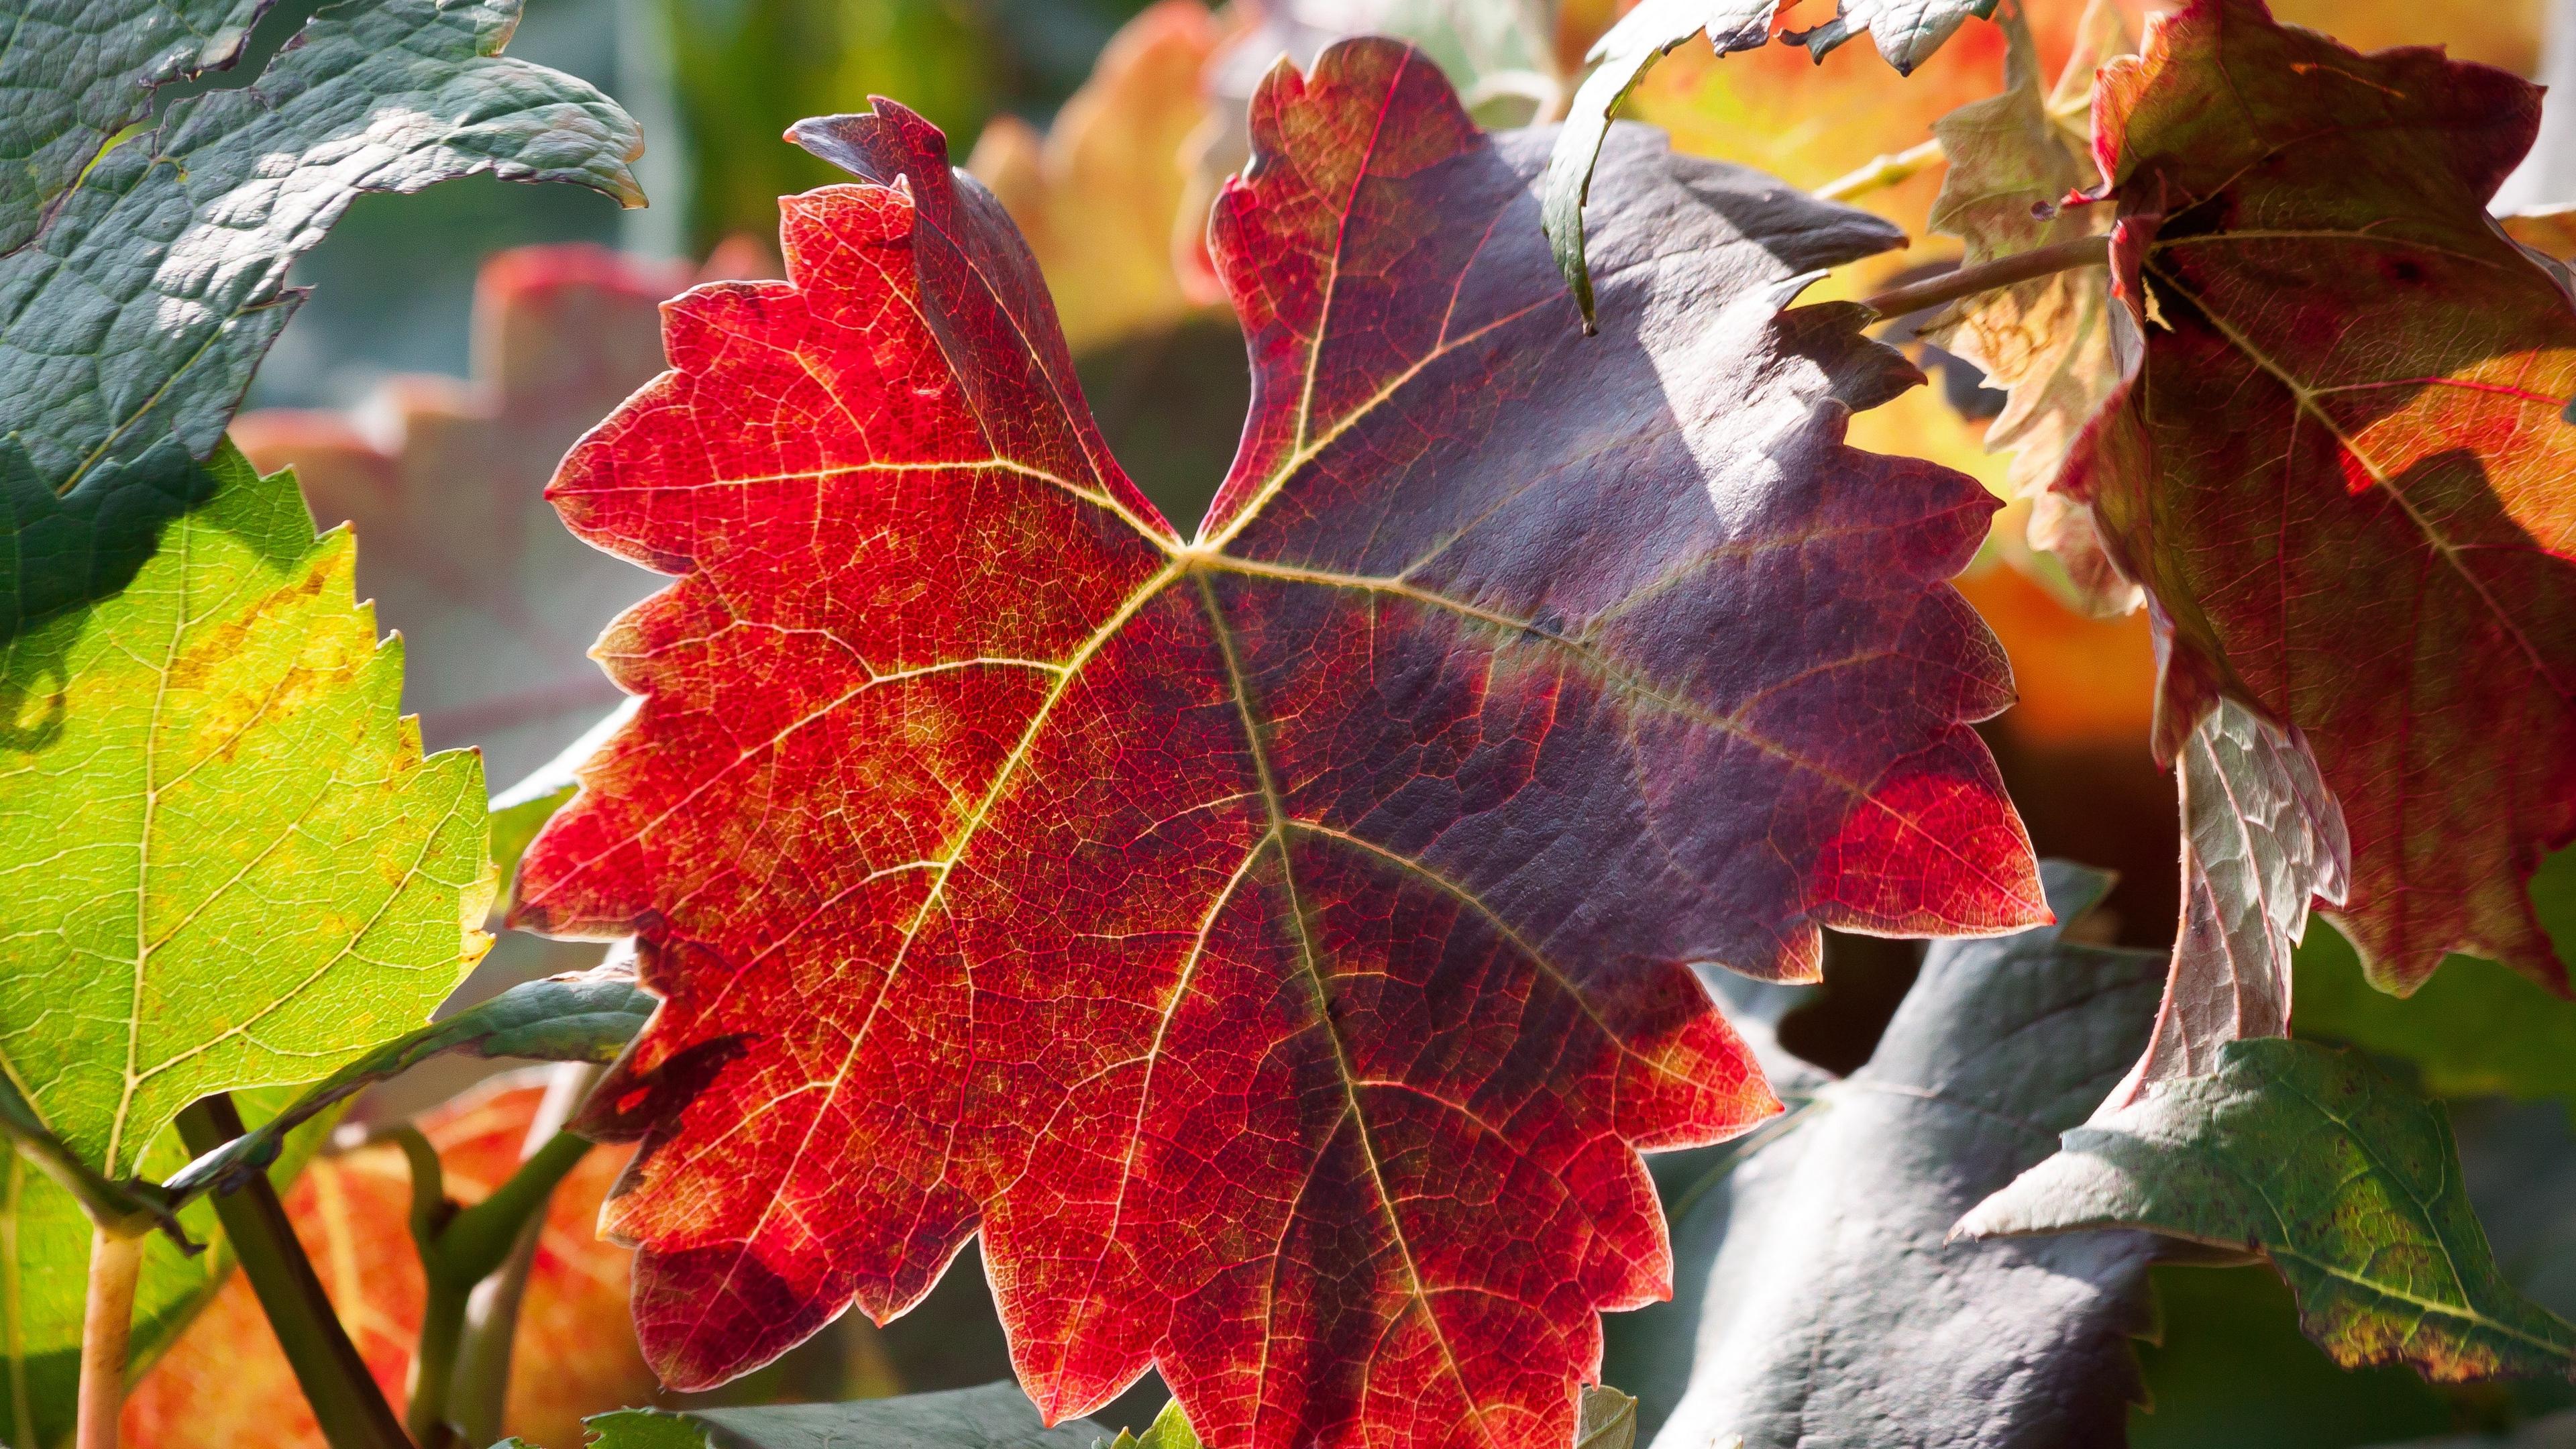 leaf autumn vines branches 4k 1541117875 - leaf, autumn, vines, branches 4k - vines, leaf, Autumn